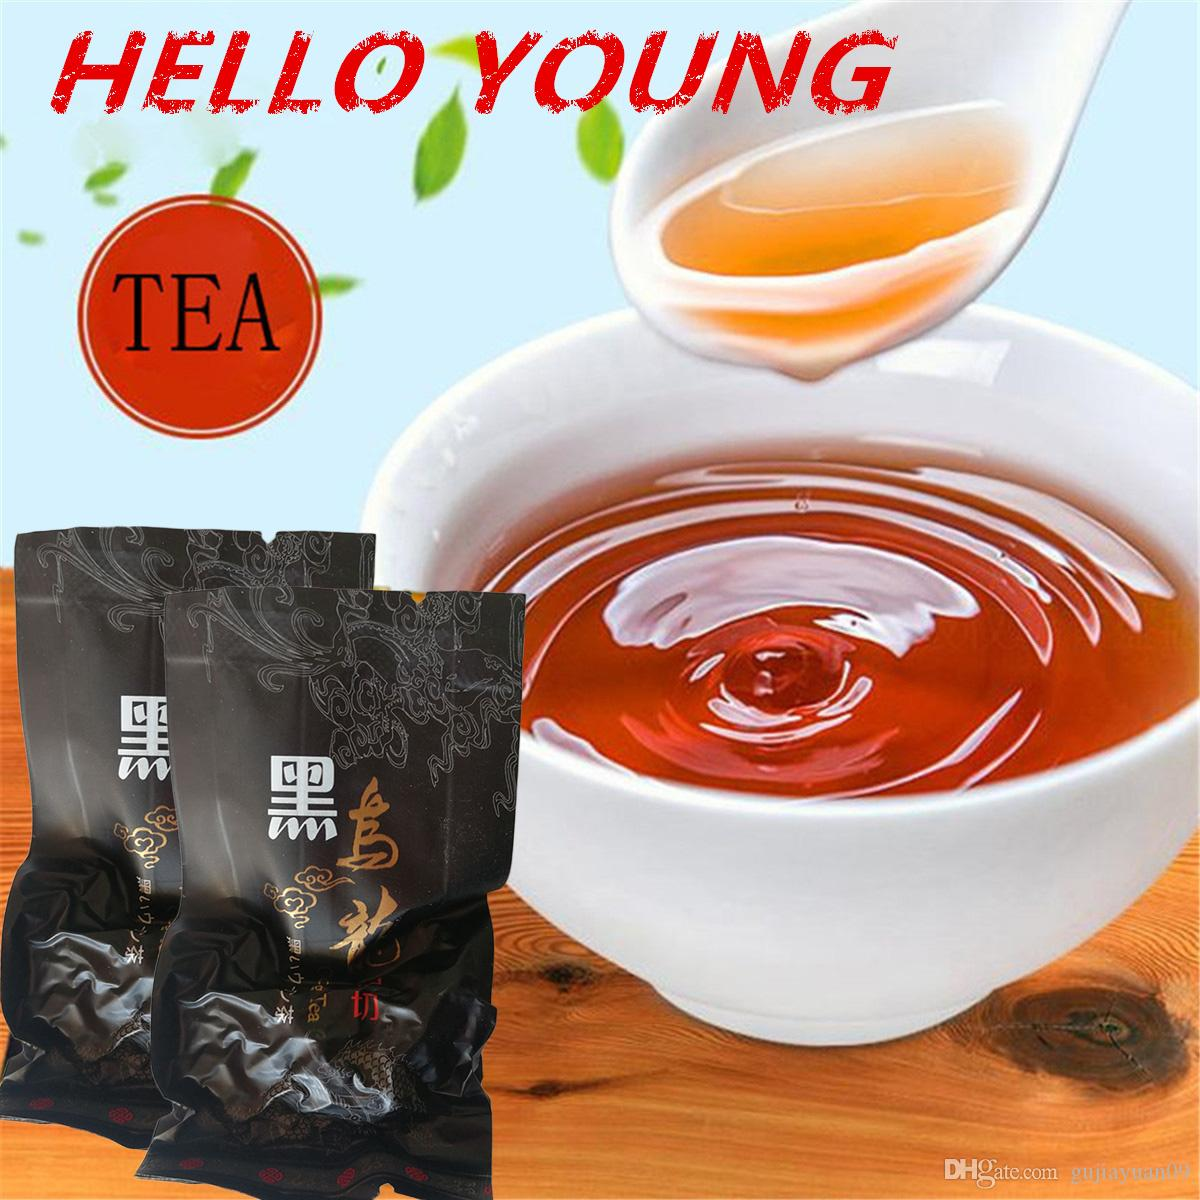 75g Çin Organik Toplu Siyah Oolong Çay Fırında Tieguanyin Yeşil Çay Yeni Bahar Çay Sağlıklı Yeşil Gıda Sıcak satış